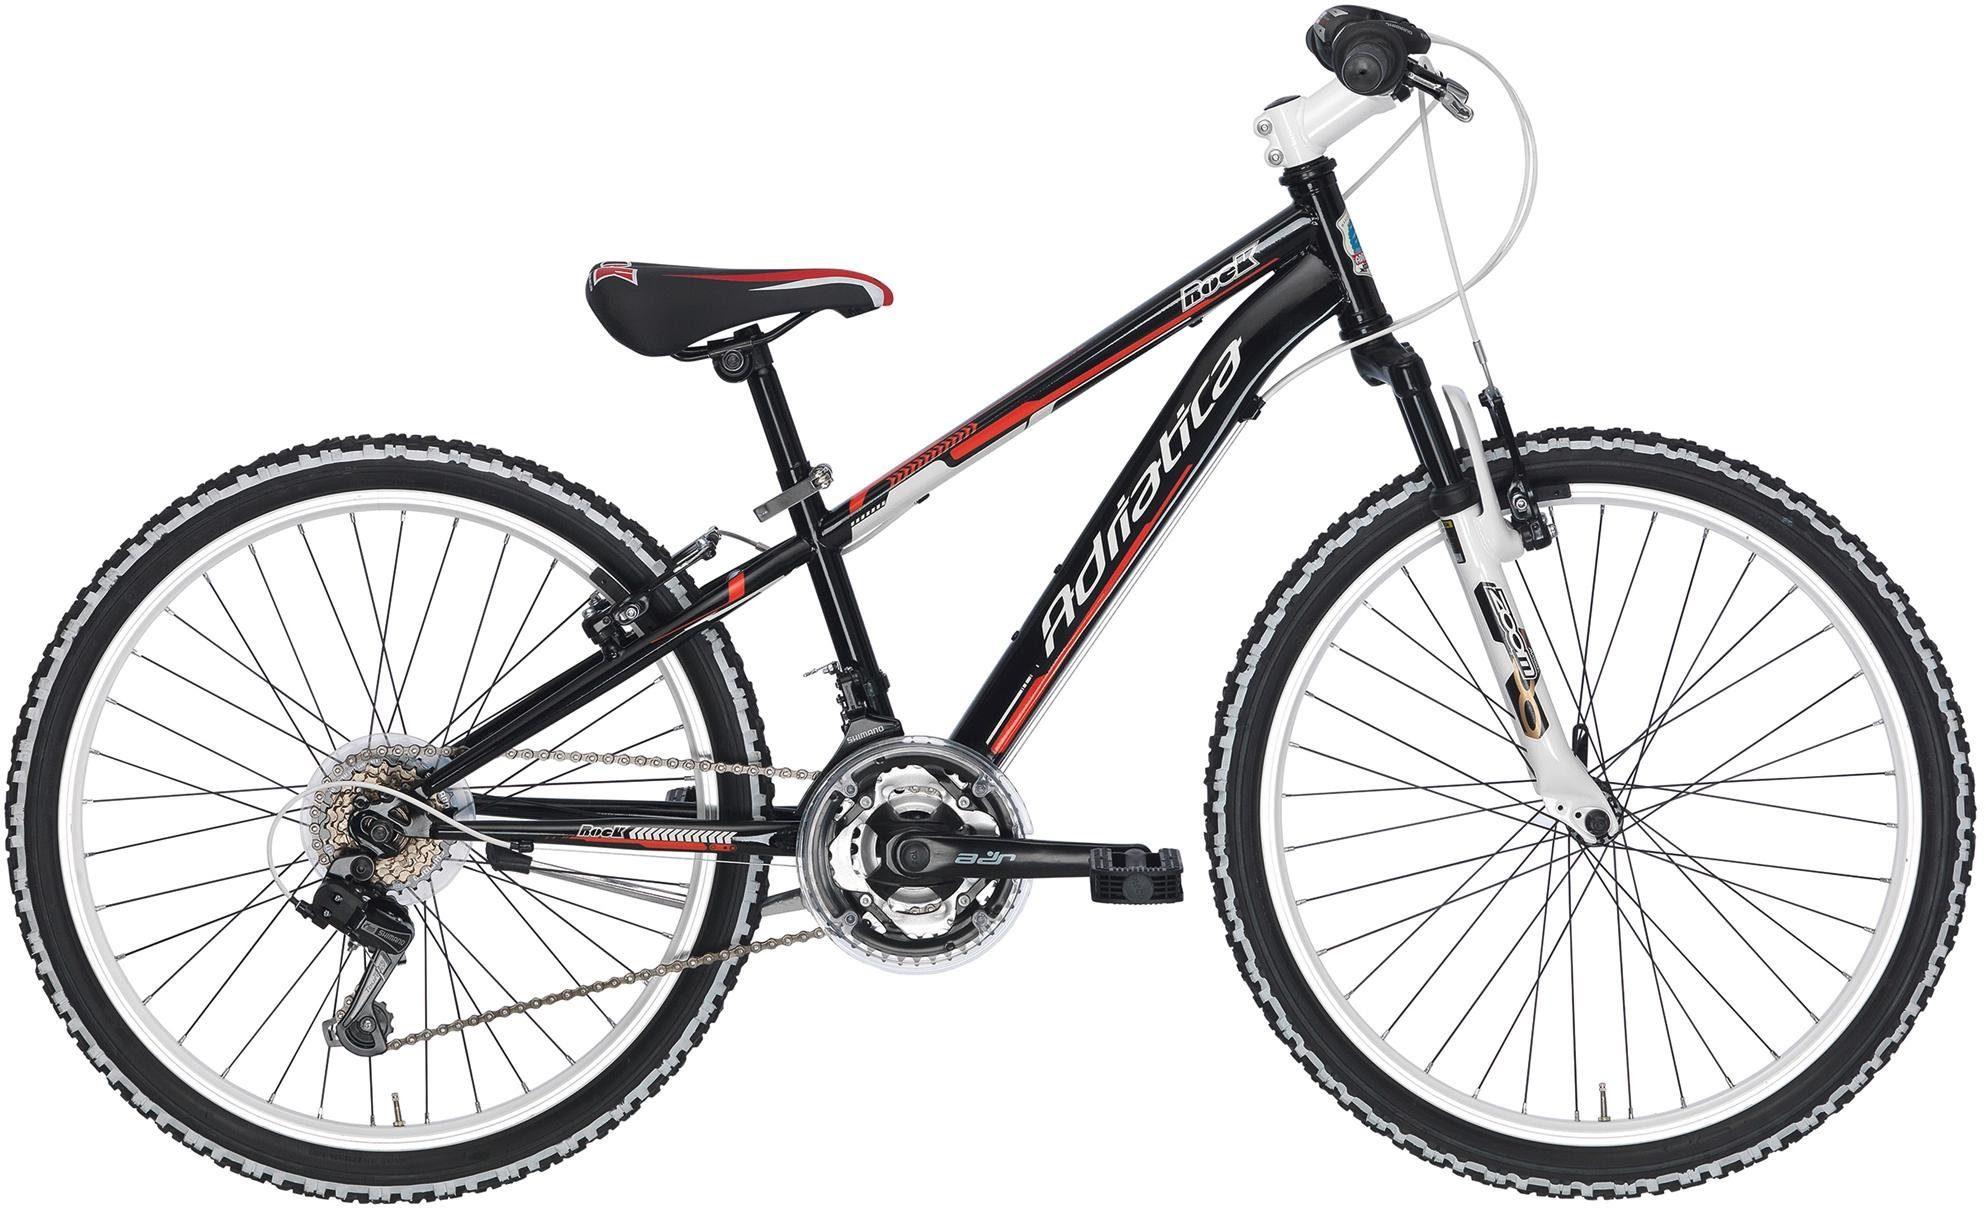 Adriatica Mountainbike »Rock 24«, 18 Gang Shimano TY21 Schaltwerk, Kettenschaltung